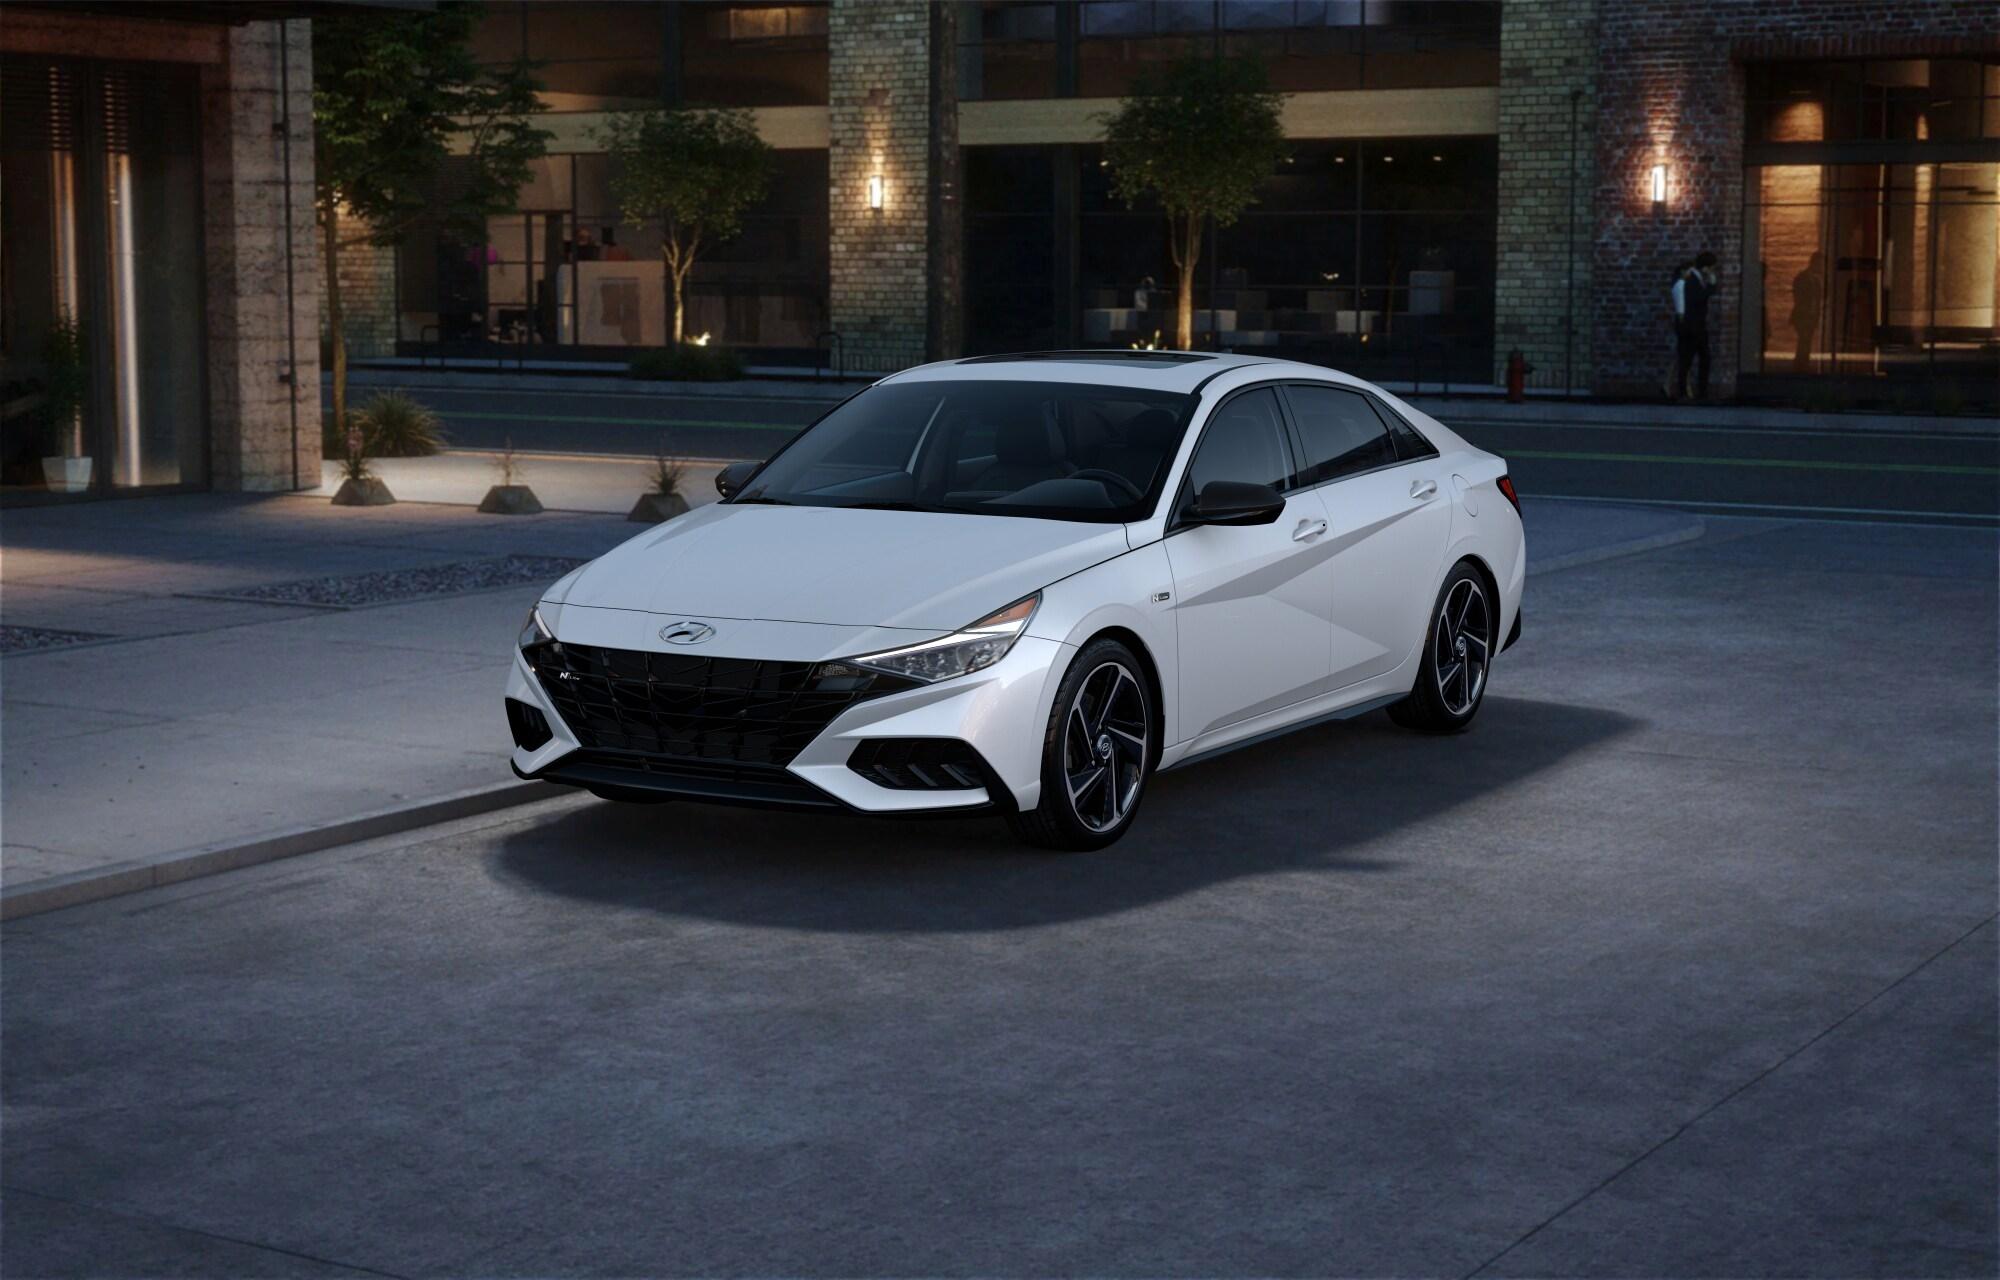 Hyundai ELANTRA N LINE 2021 Blanc polaire